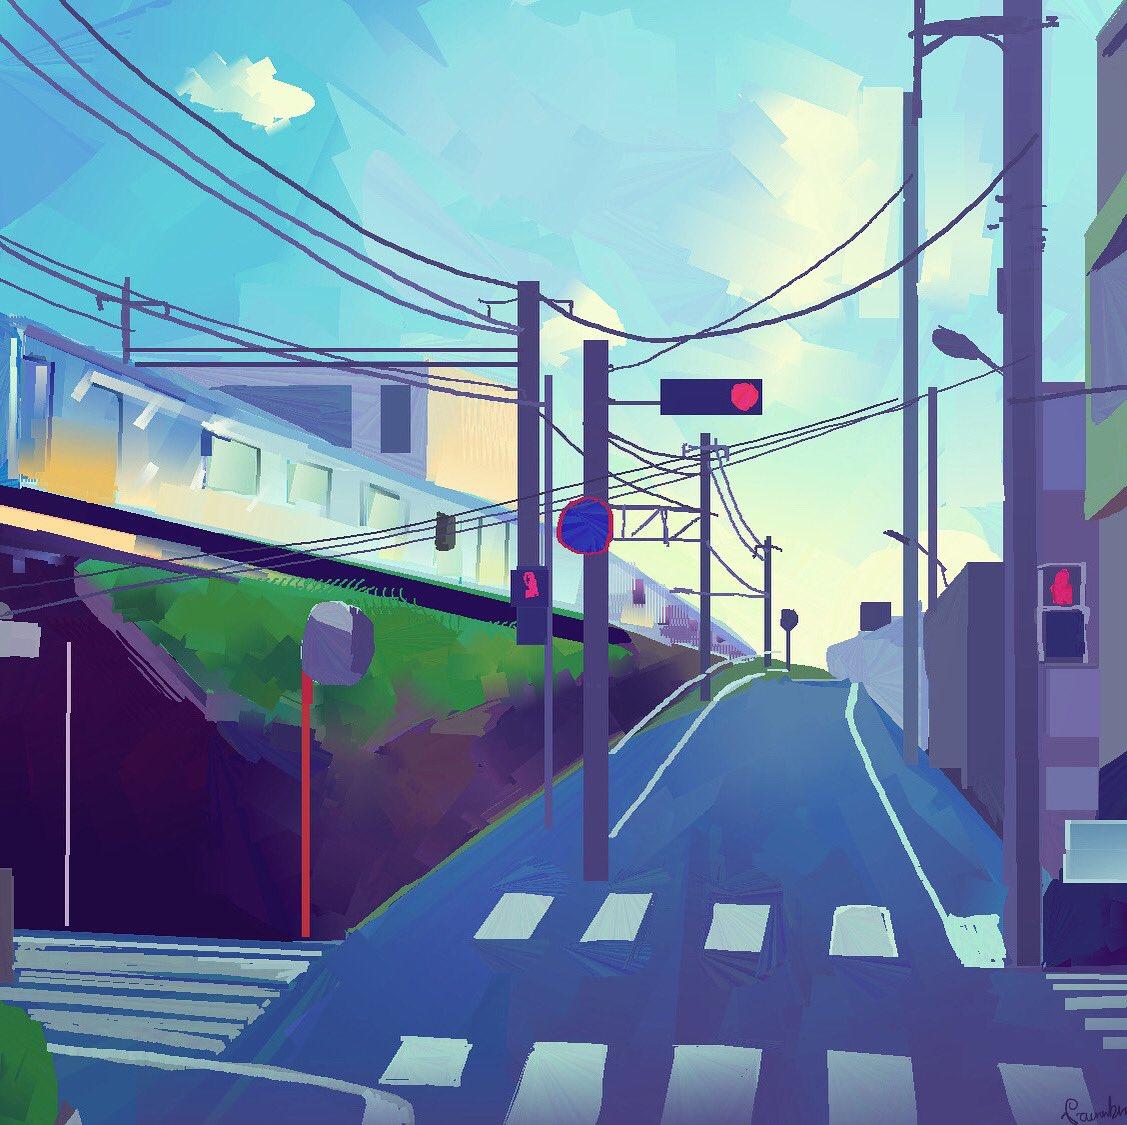 Japan street view  #HEAVYPAINT #japan #sketchpic.twitter.com/wnqarDAlF5